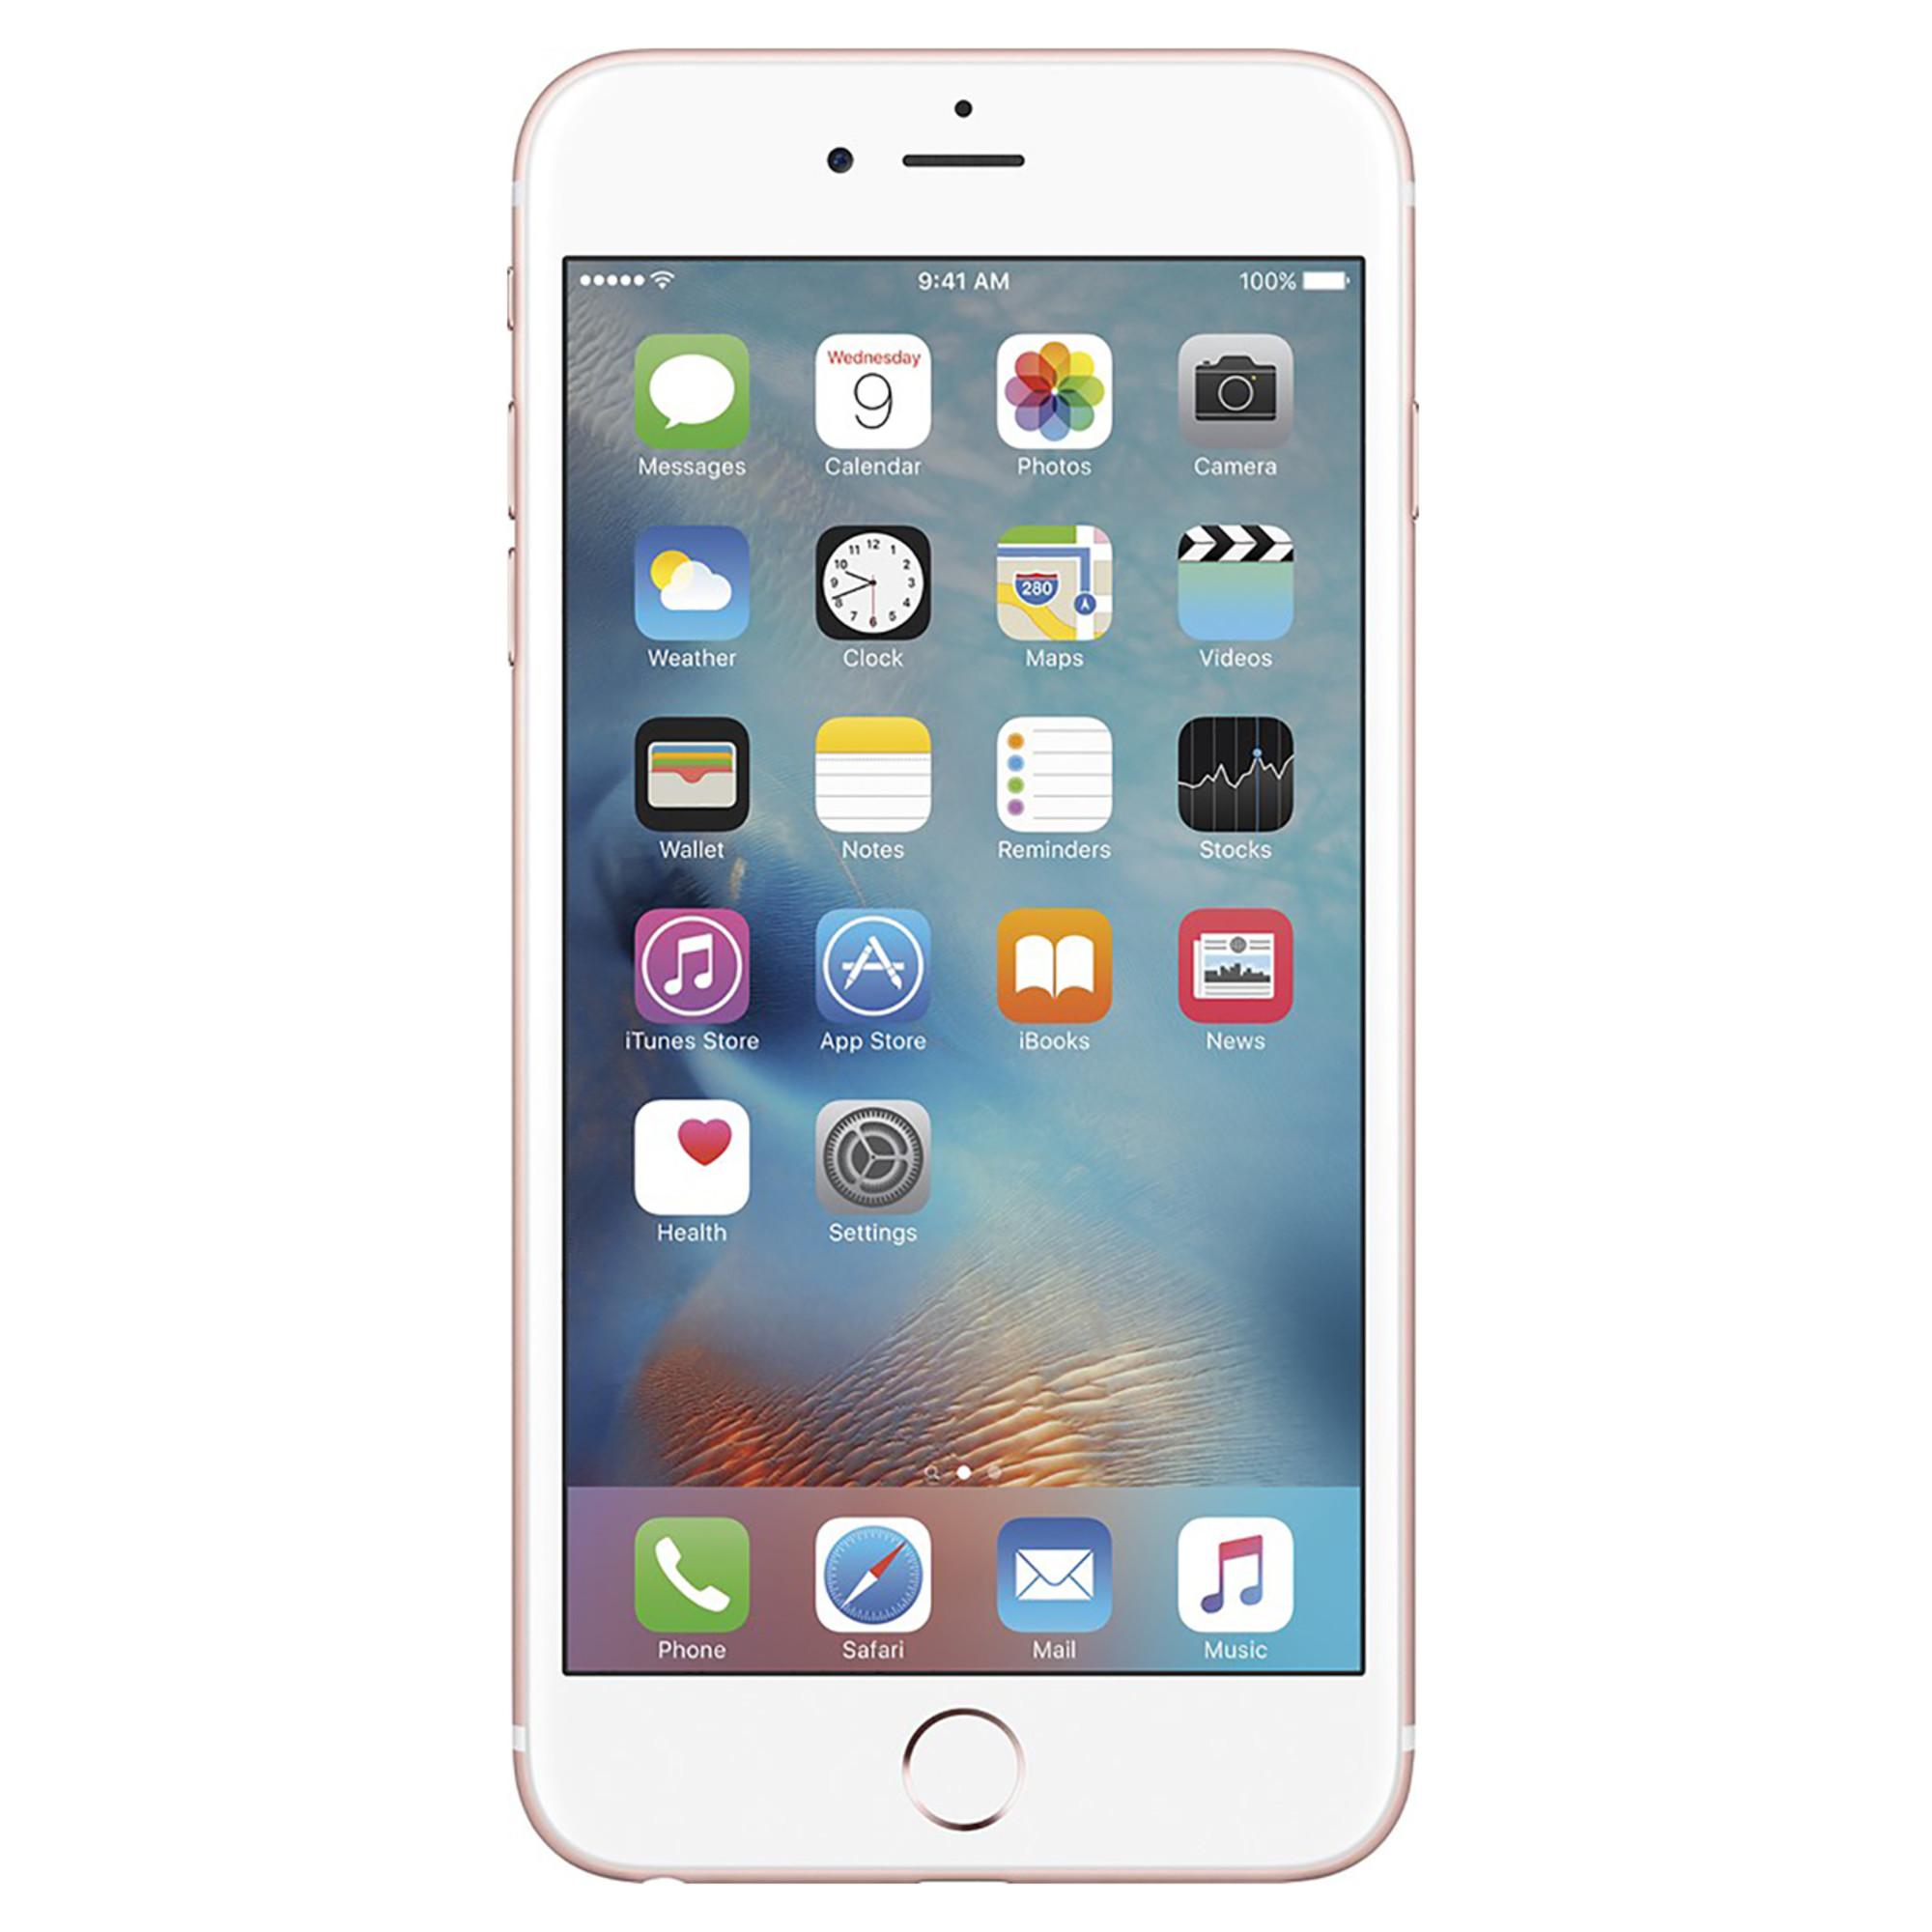 Apple iPhone 6s Plus 32GB Unlocked GSM Phone w/ 12MP Camera - Rose Gold (Used)